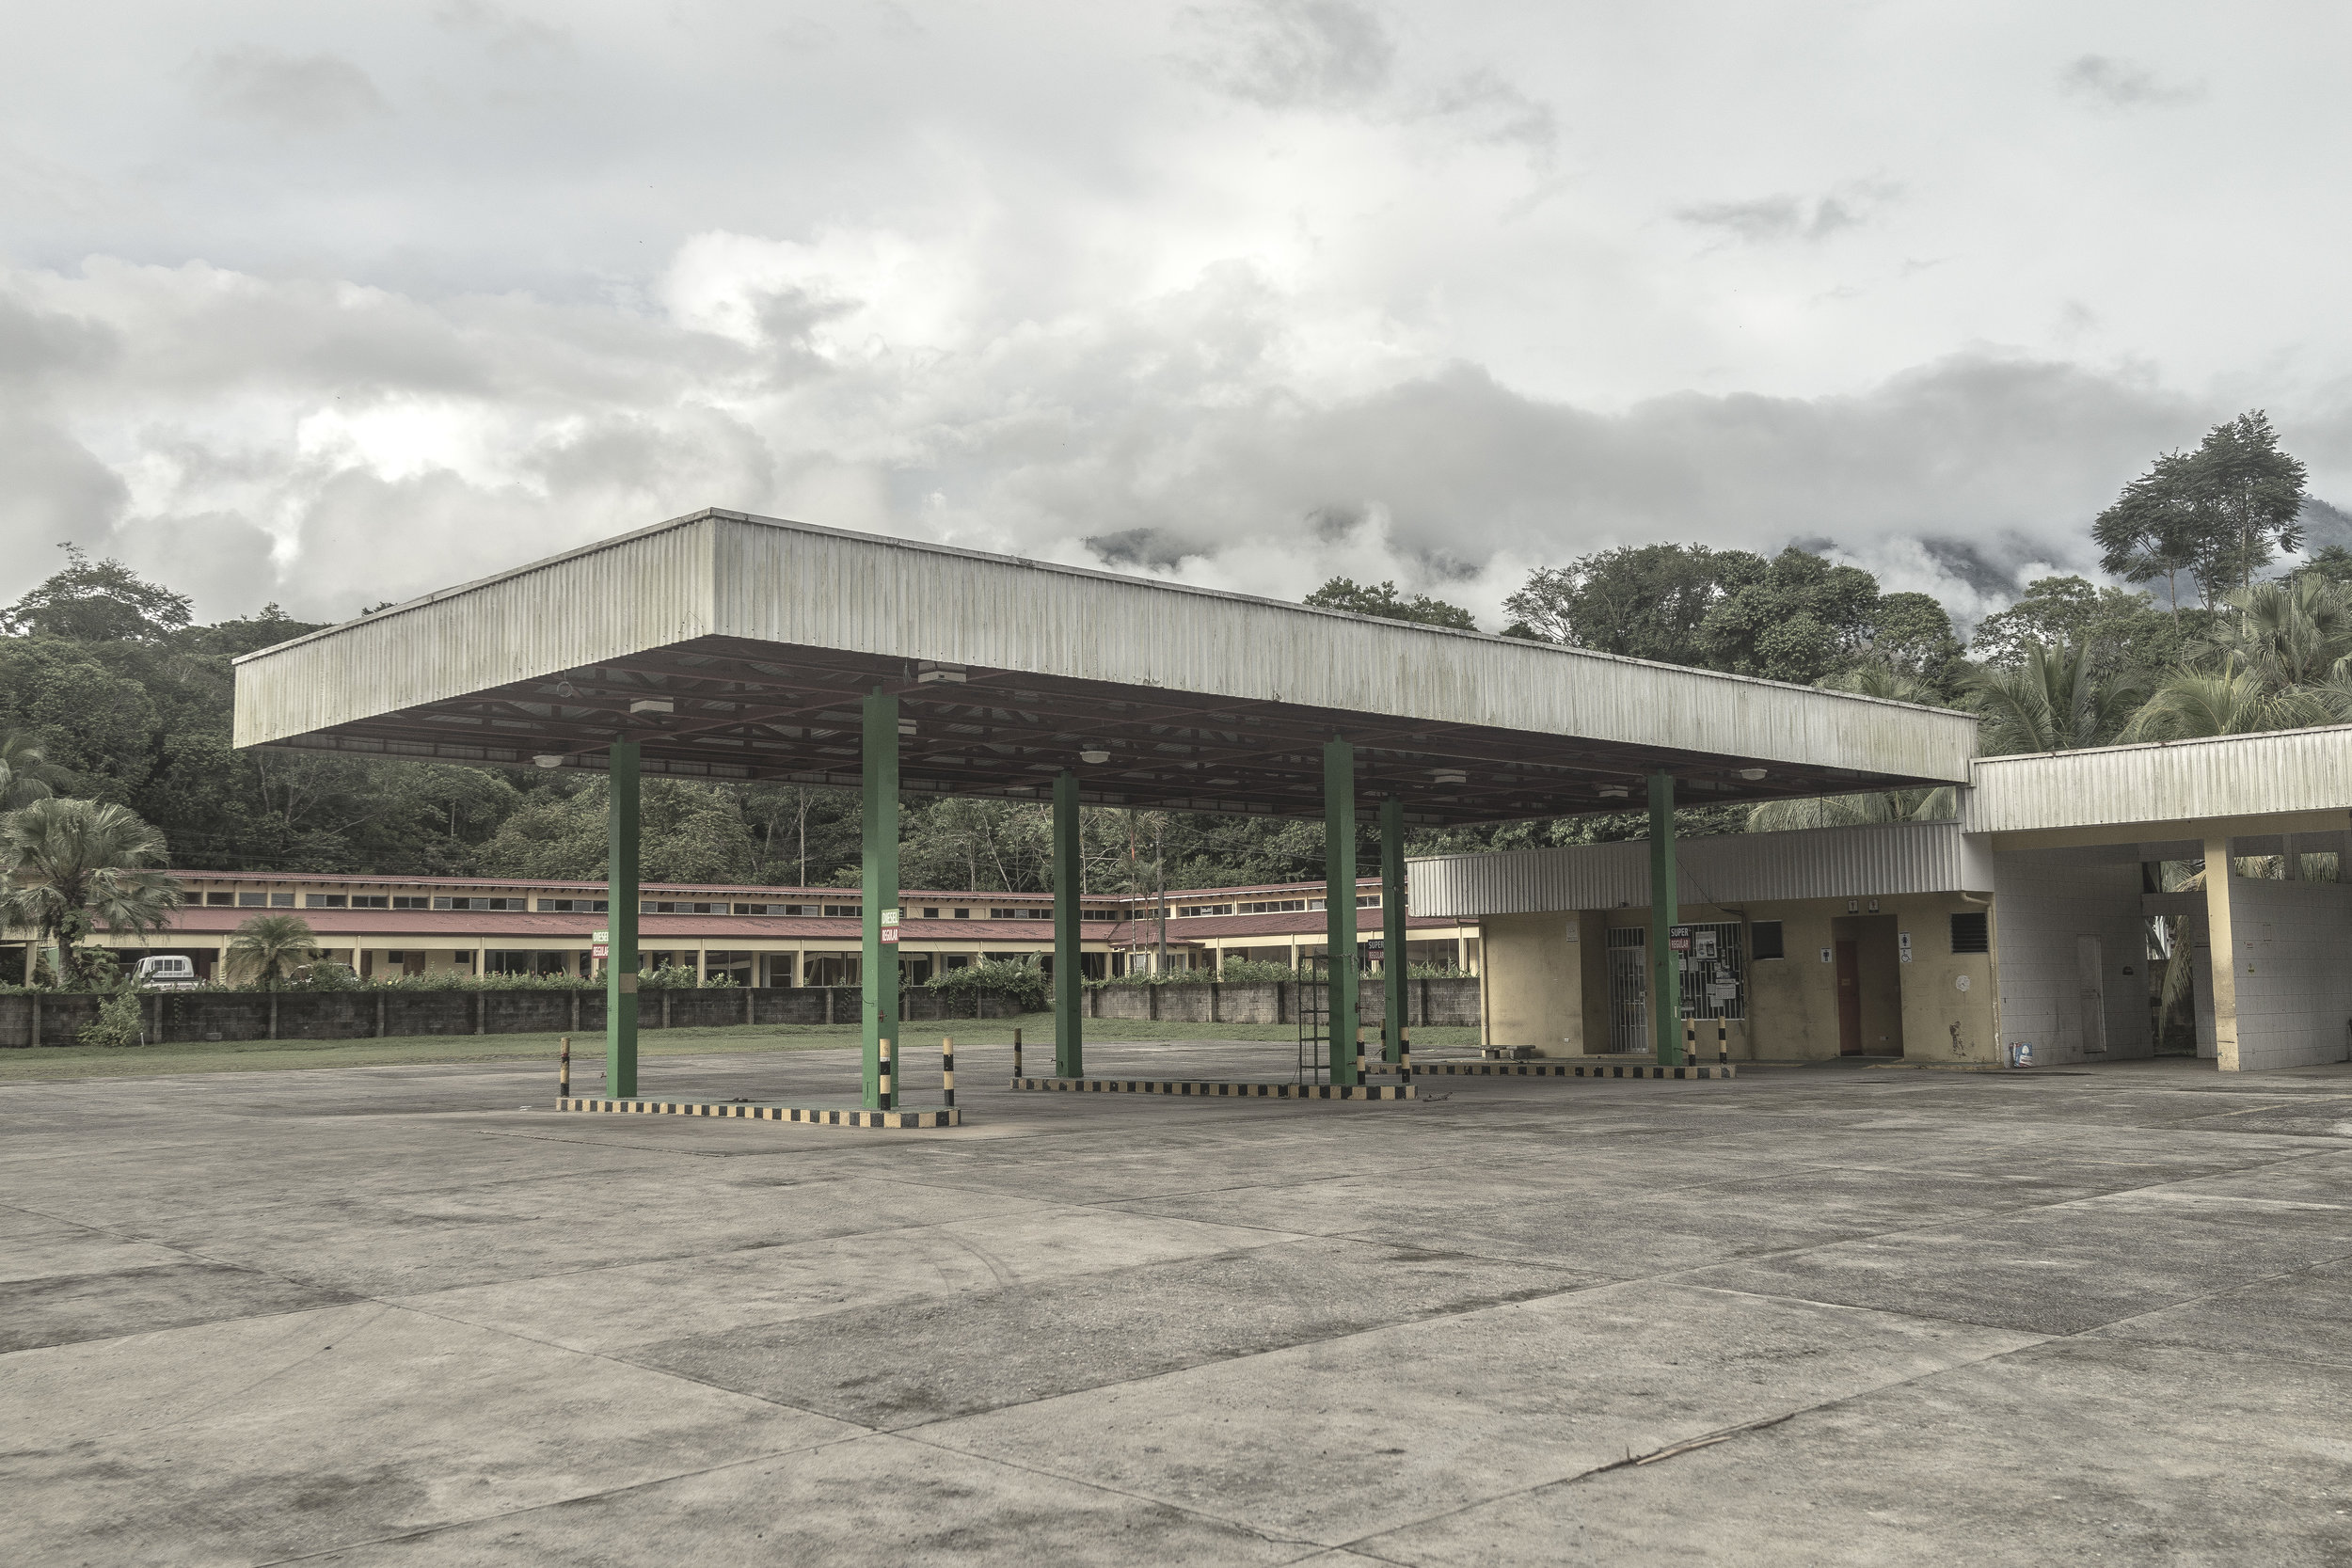 Puerto Cortés, Costa Rica